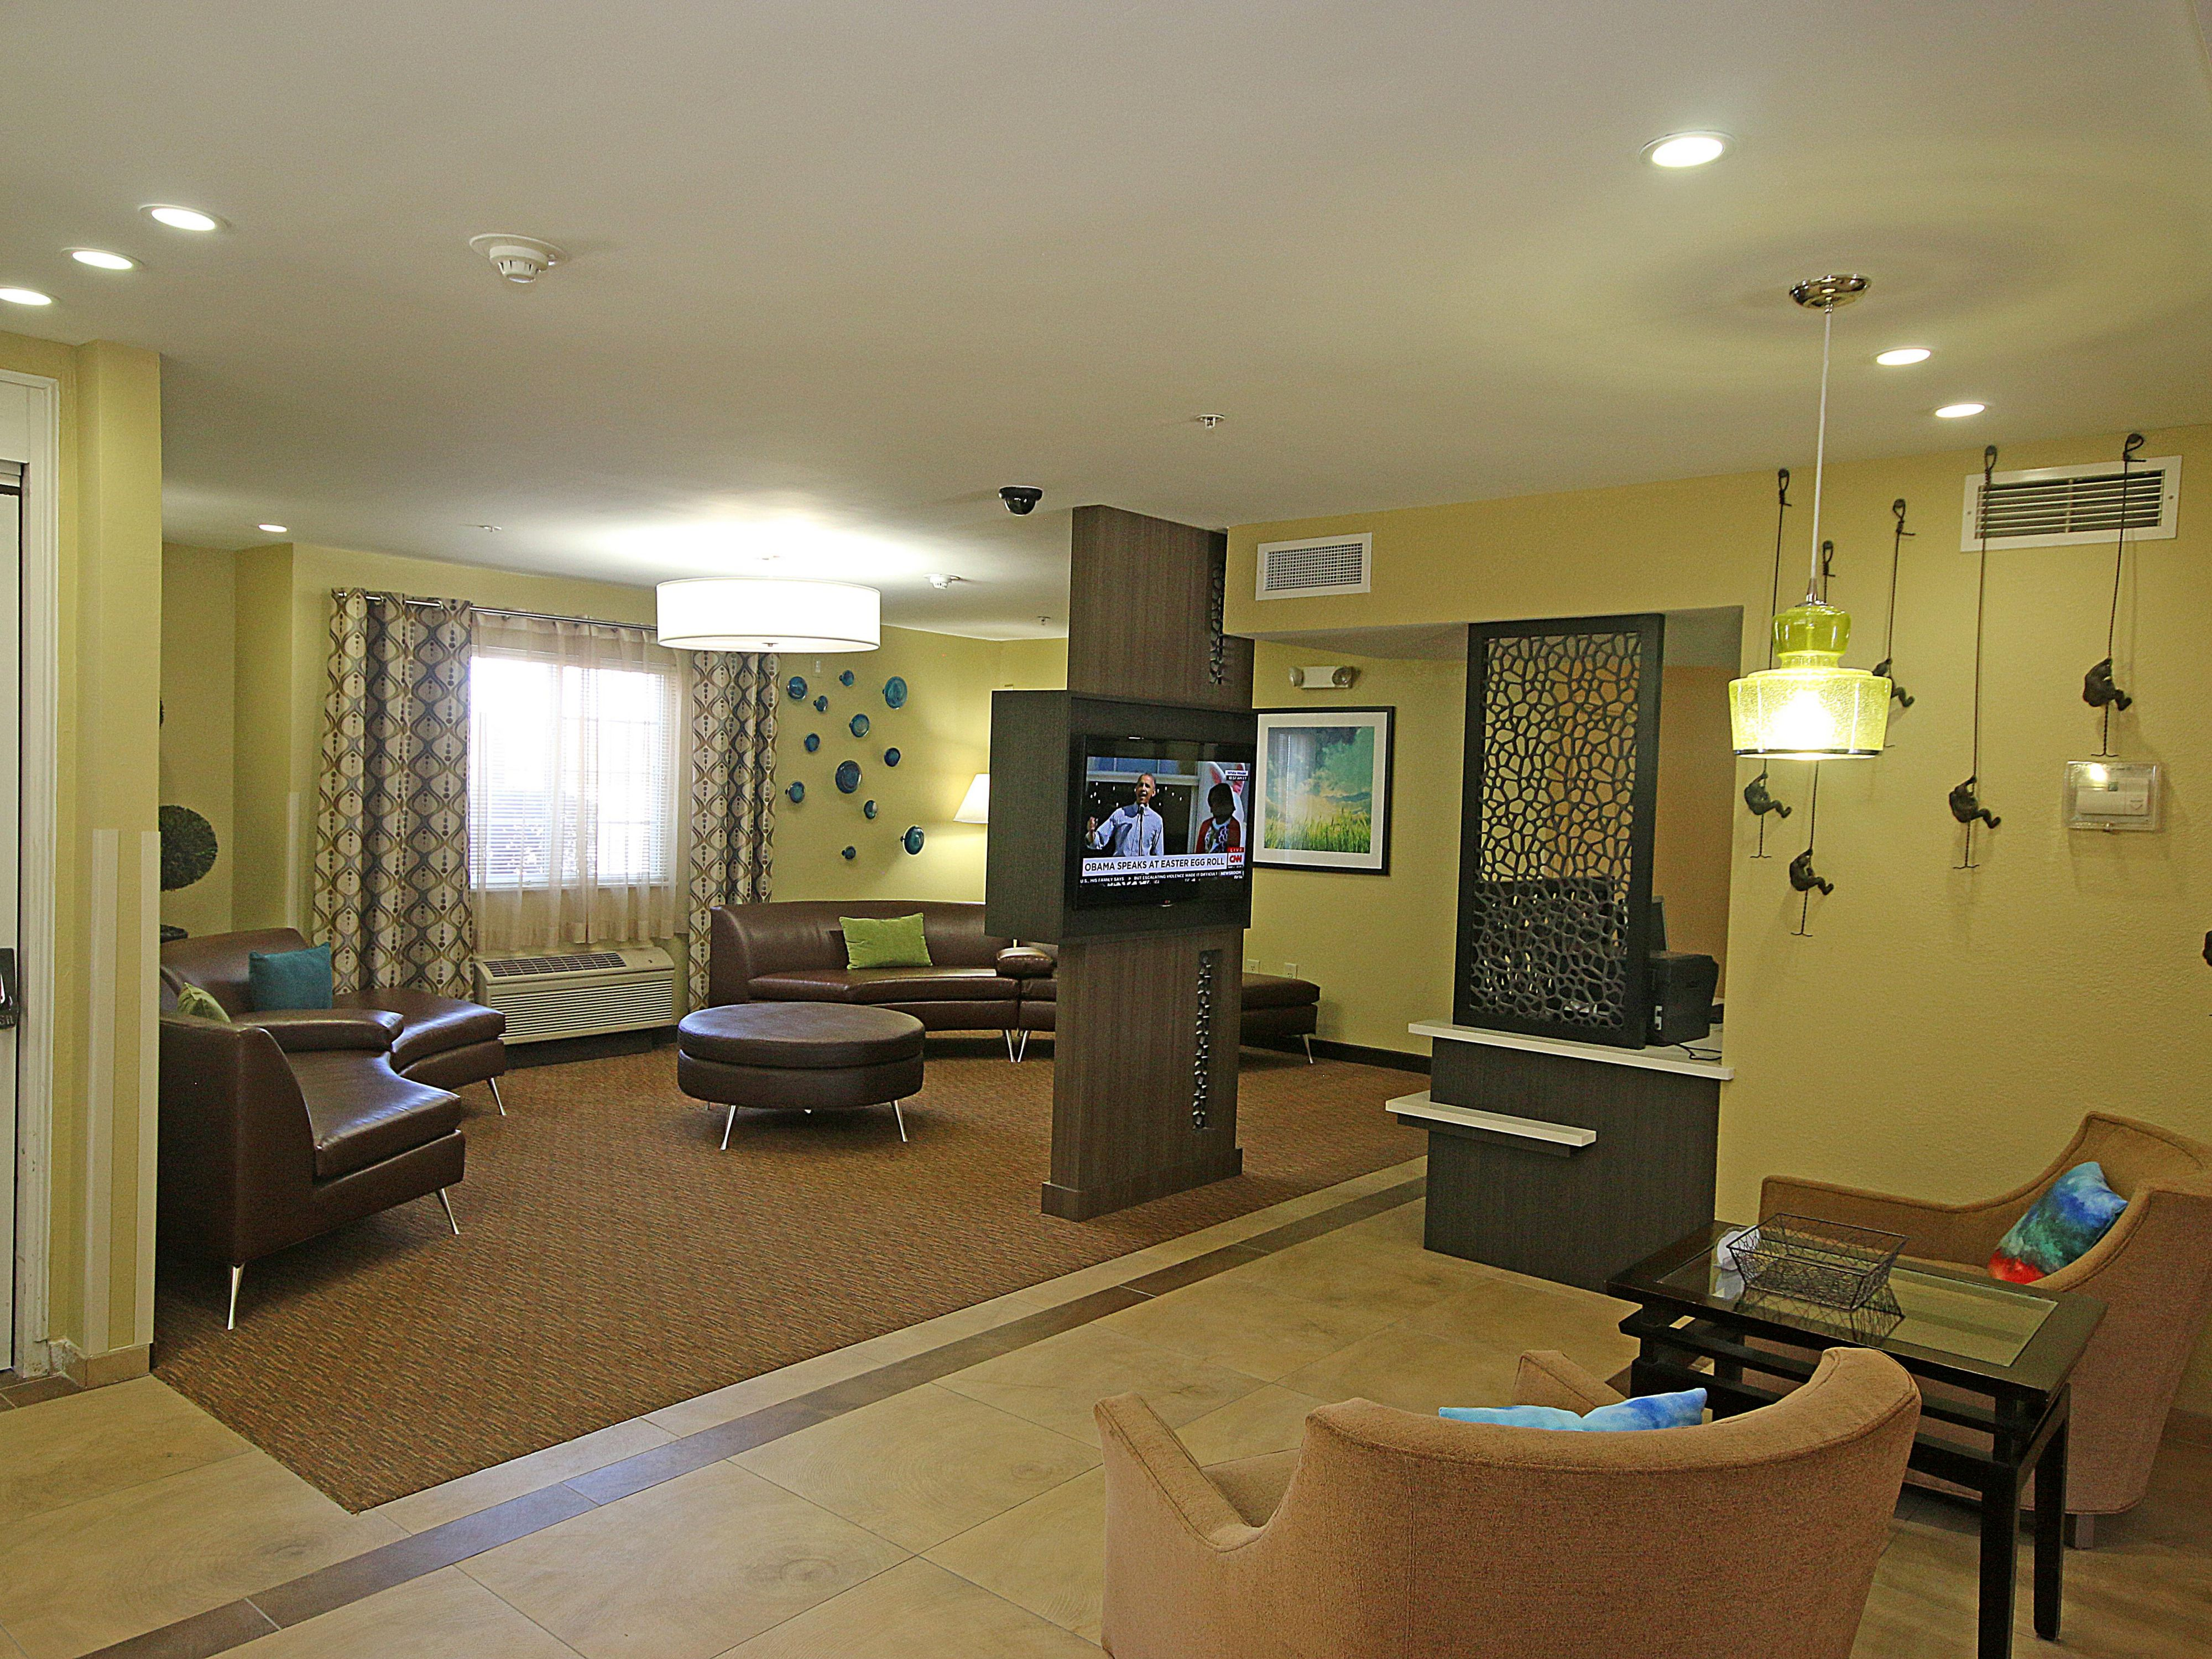 Yorktown Hotels: Candlewood Suites Newport News/Yorktown   Extended Stay  Hotel In Yorktown, Virginia